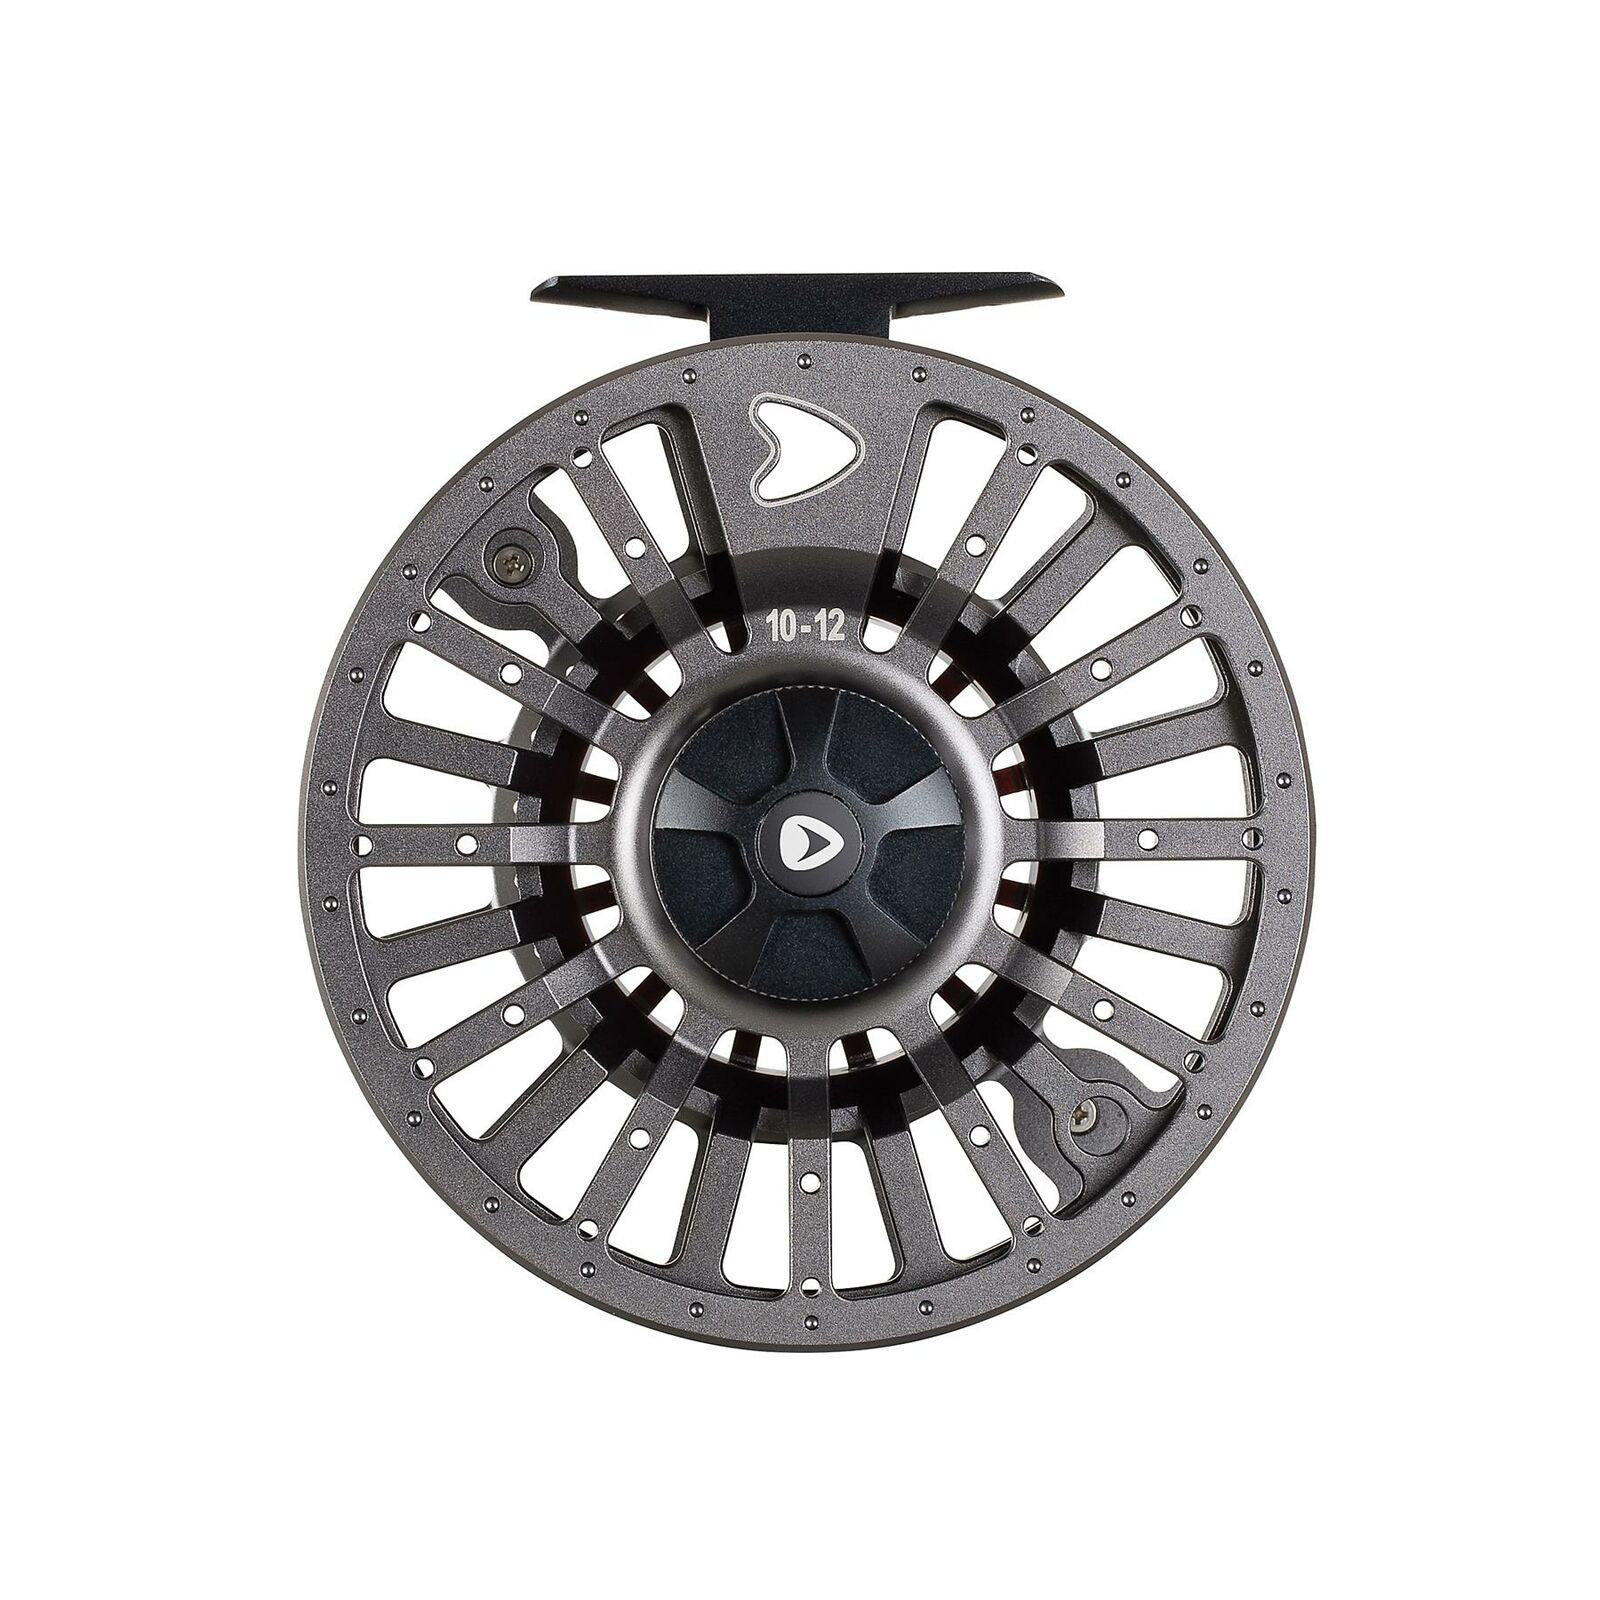 Greys GX1000 4/5/6 Reel / Fly Fishing